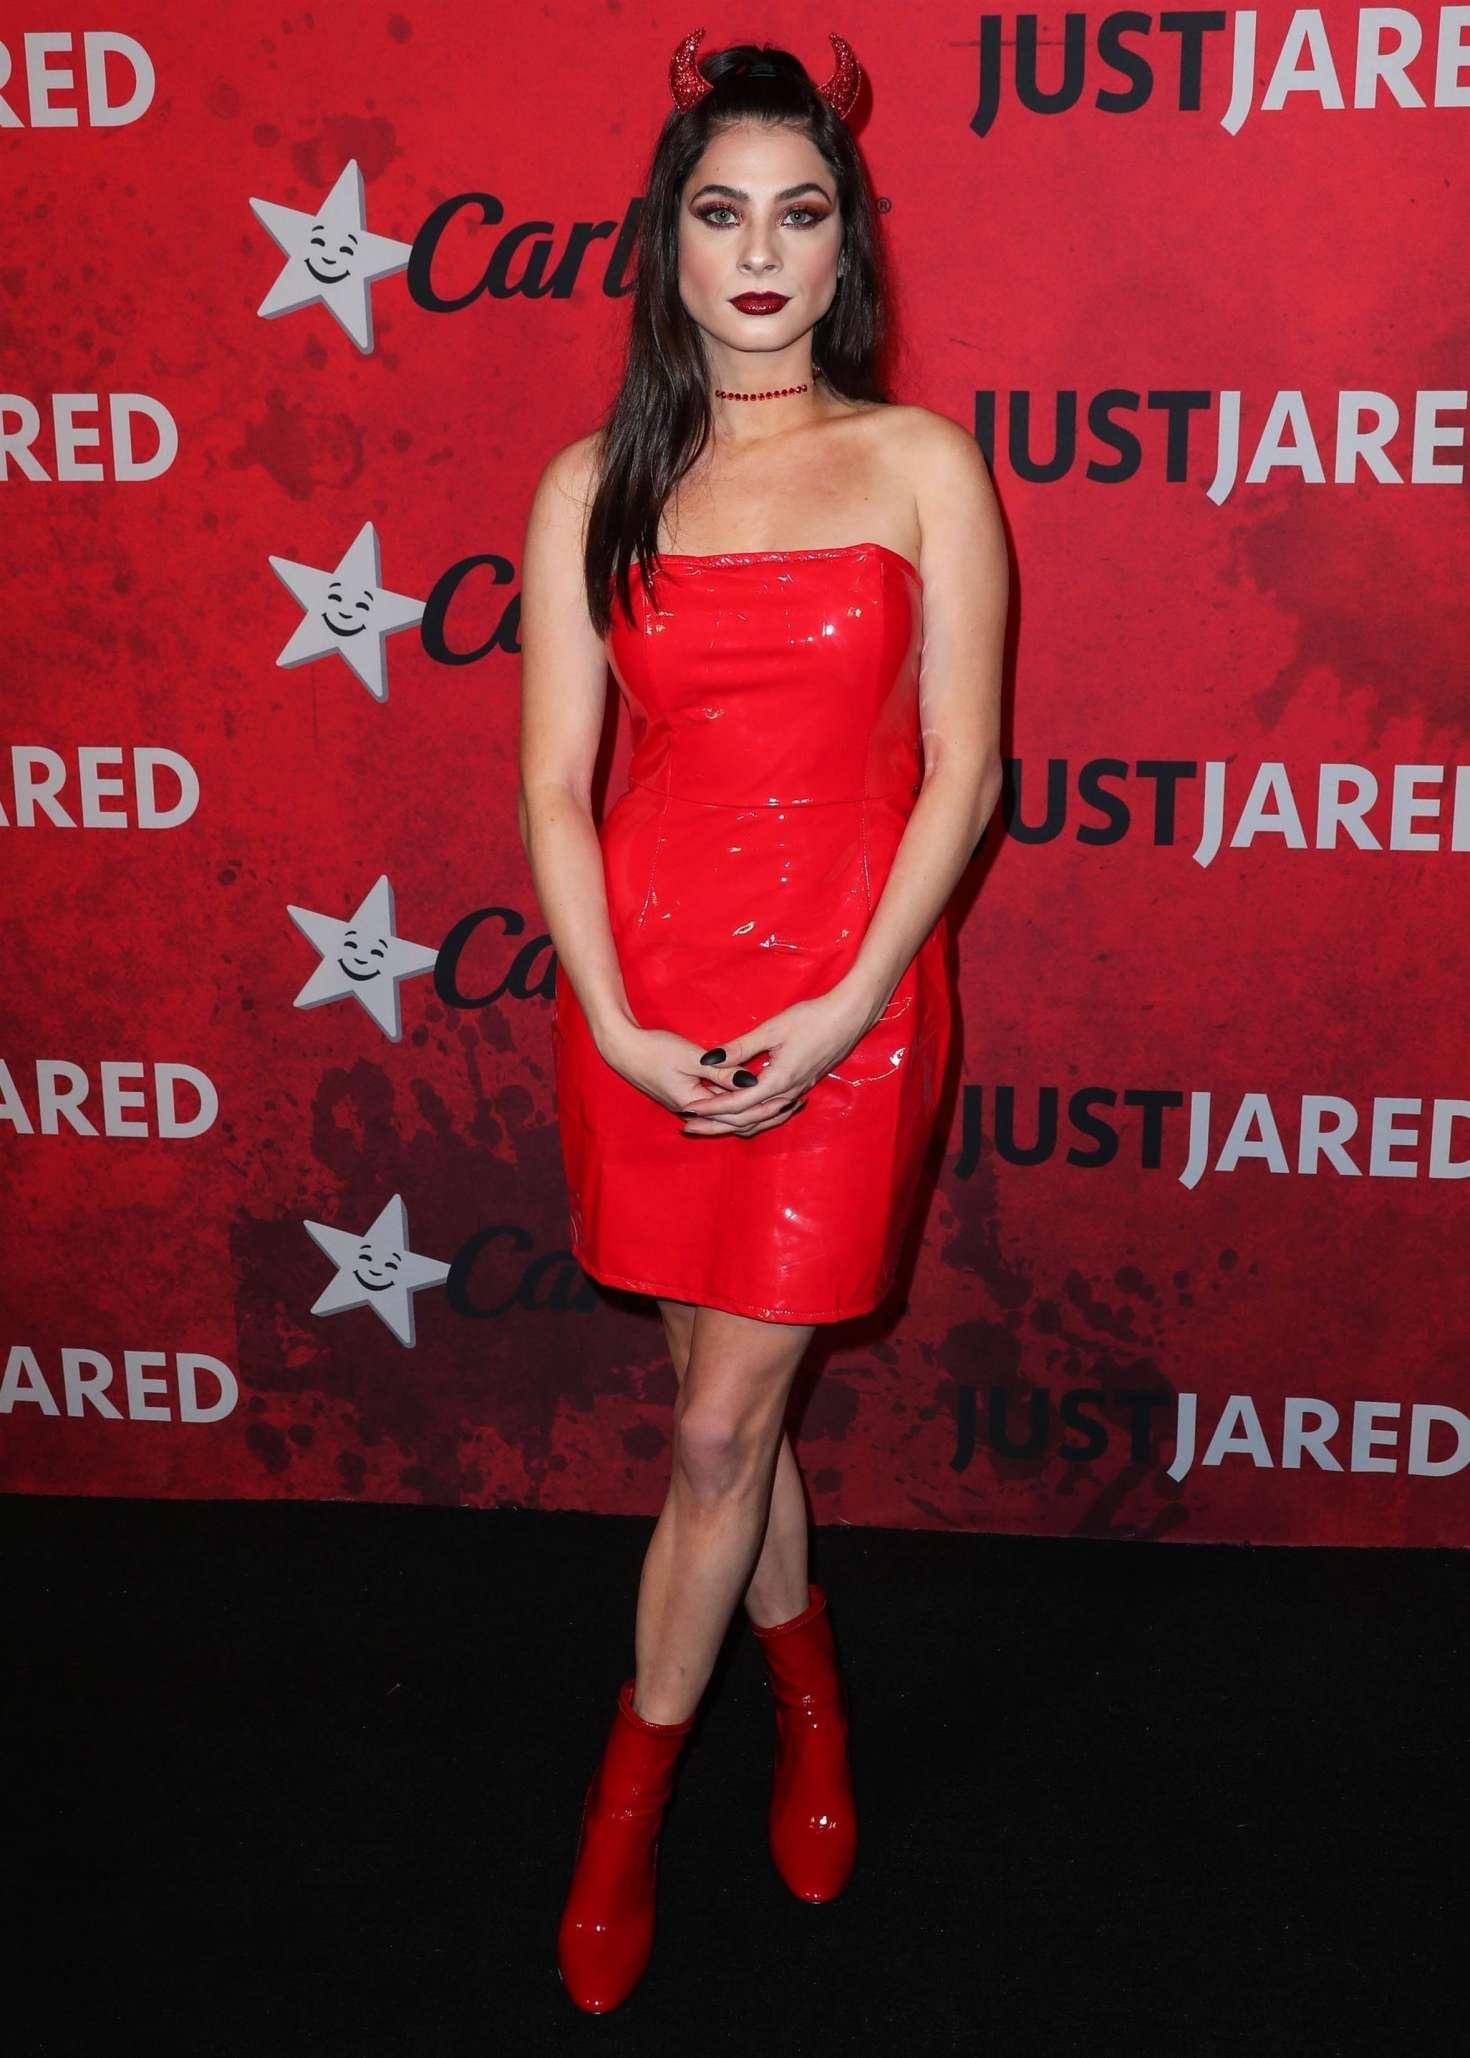 Niki Koss 2018 : Niki Koss: Just Jareds 7th Annual Halloween Party -06